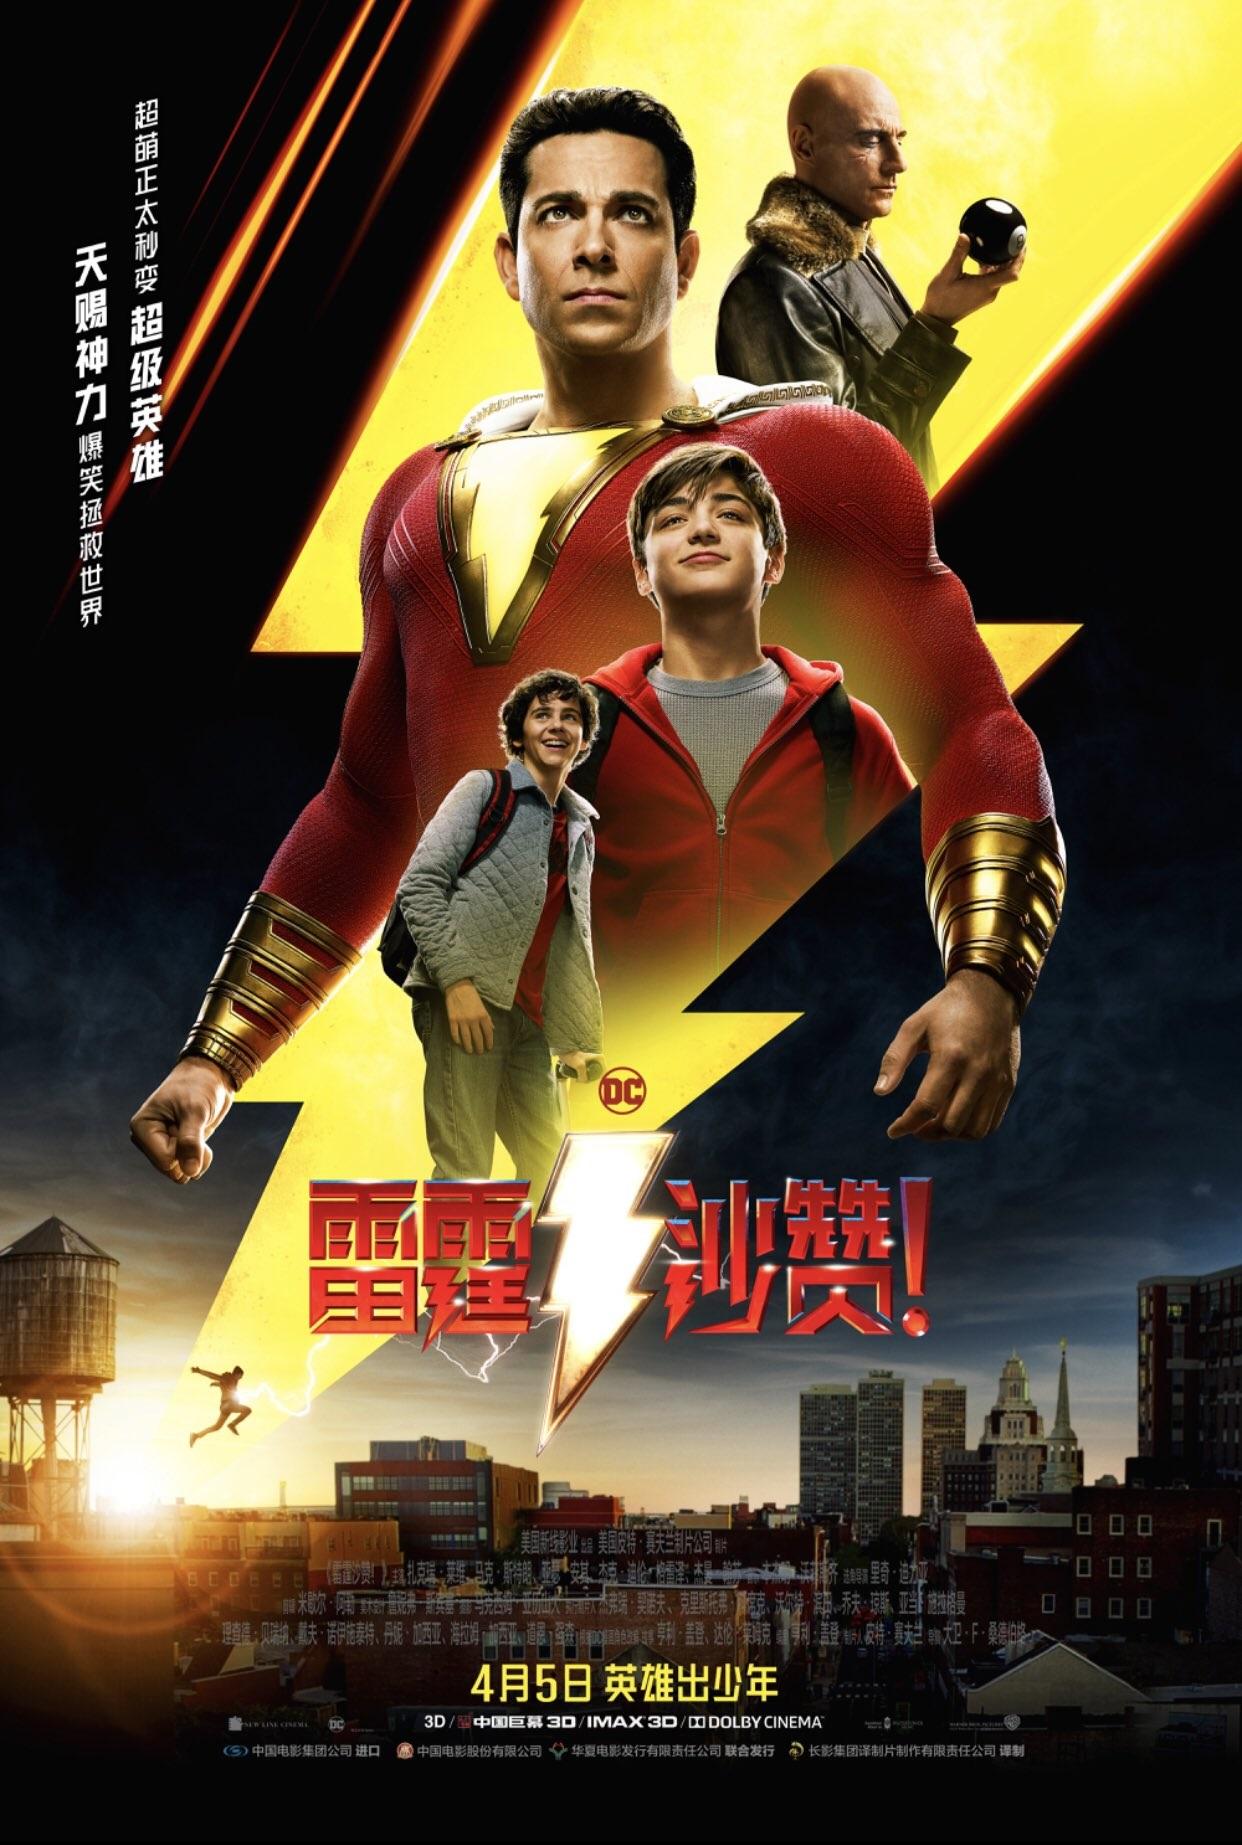 Shazam!'s Chinese poster